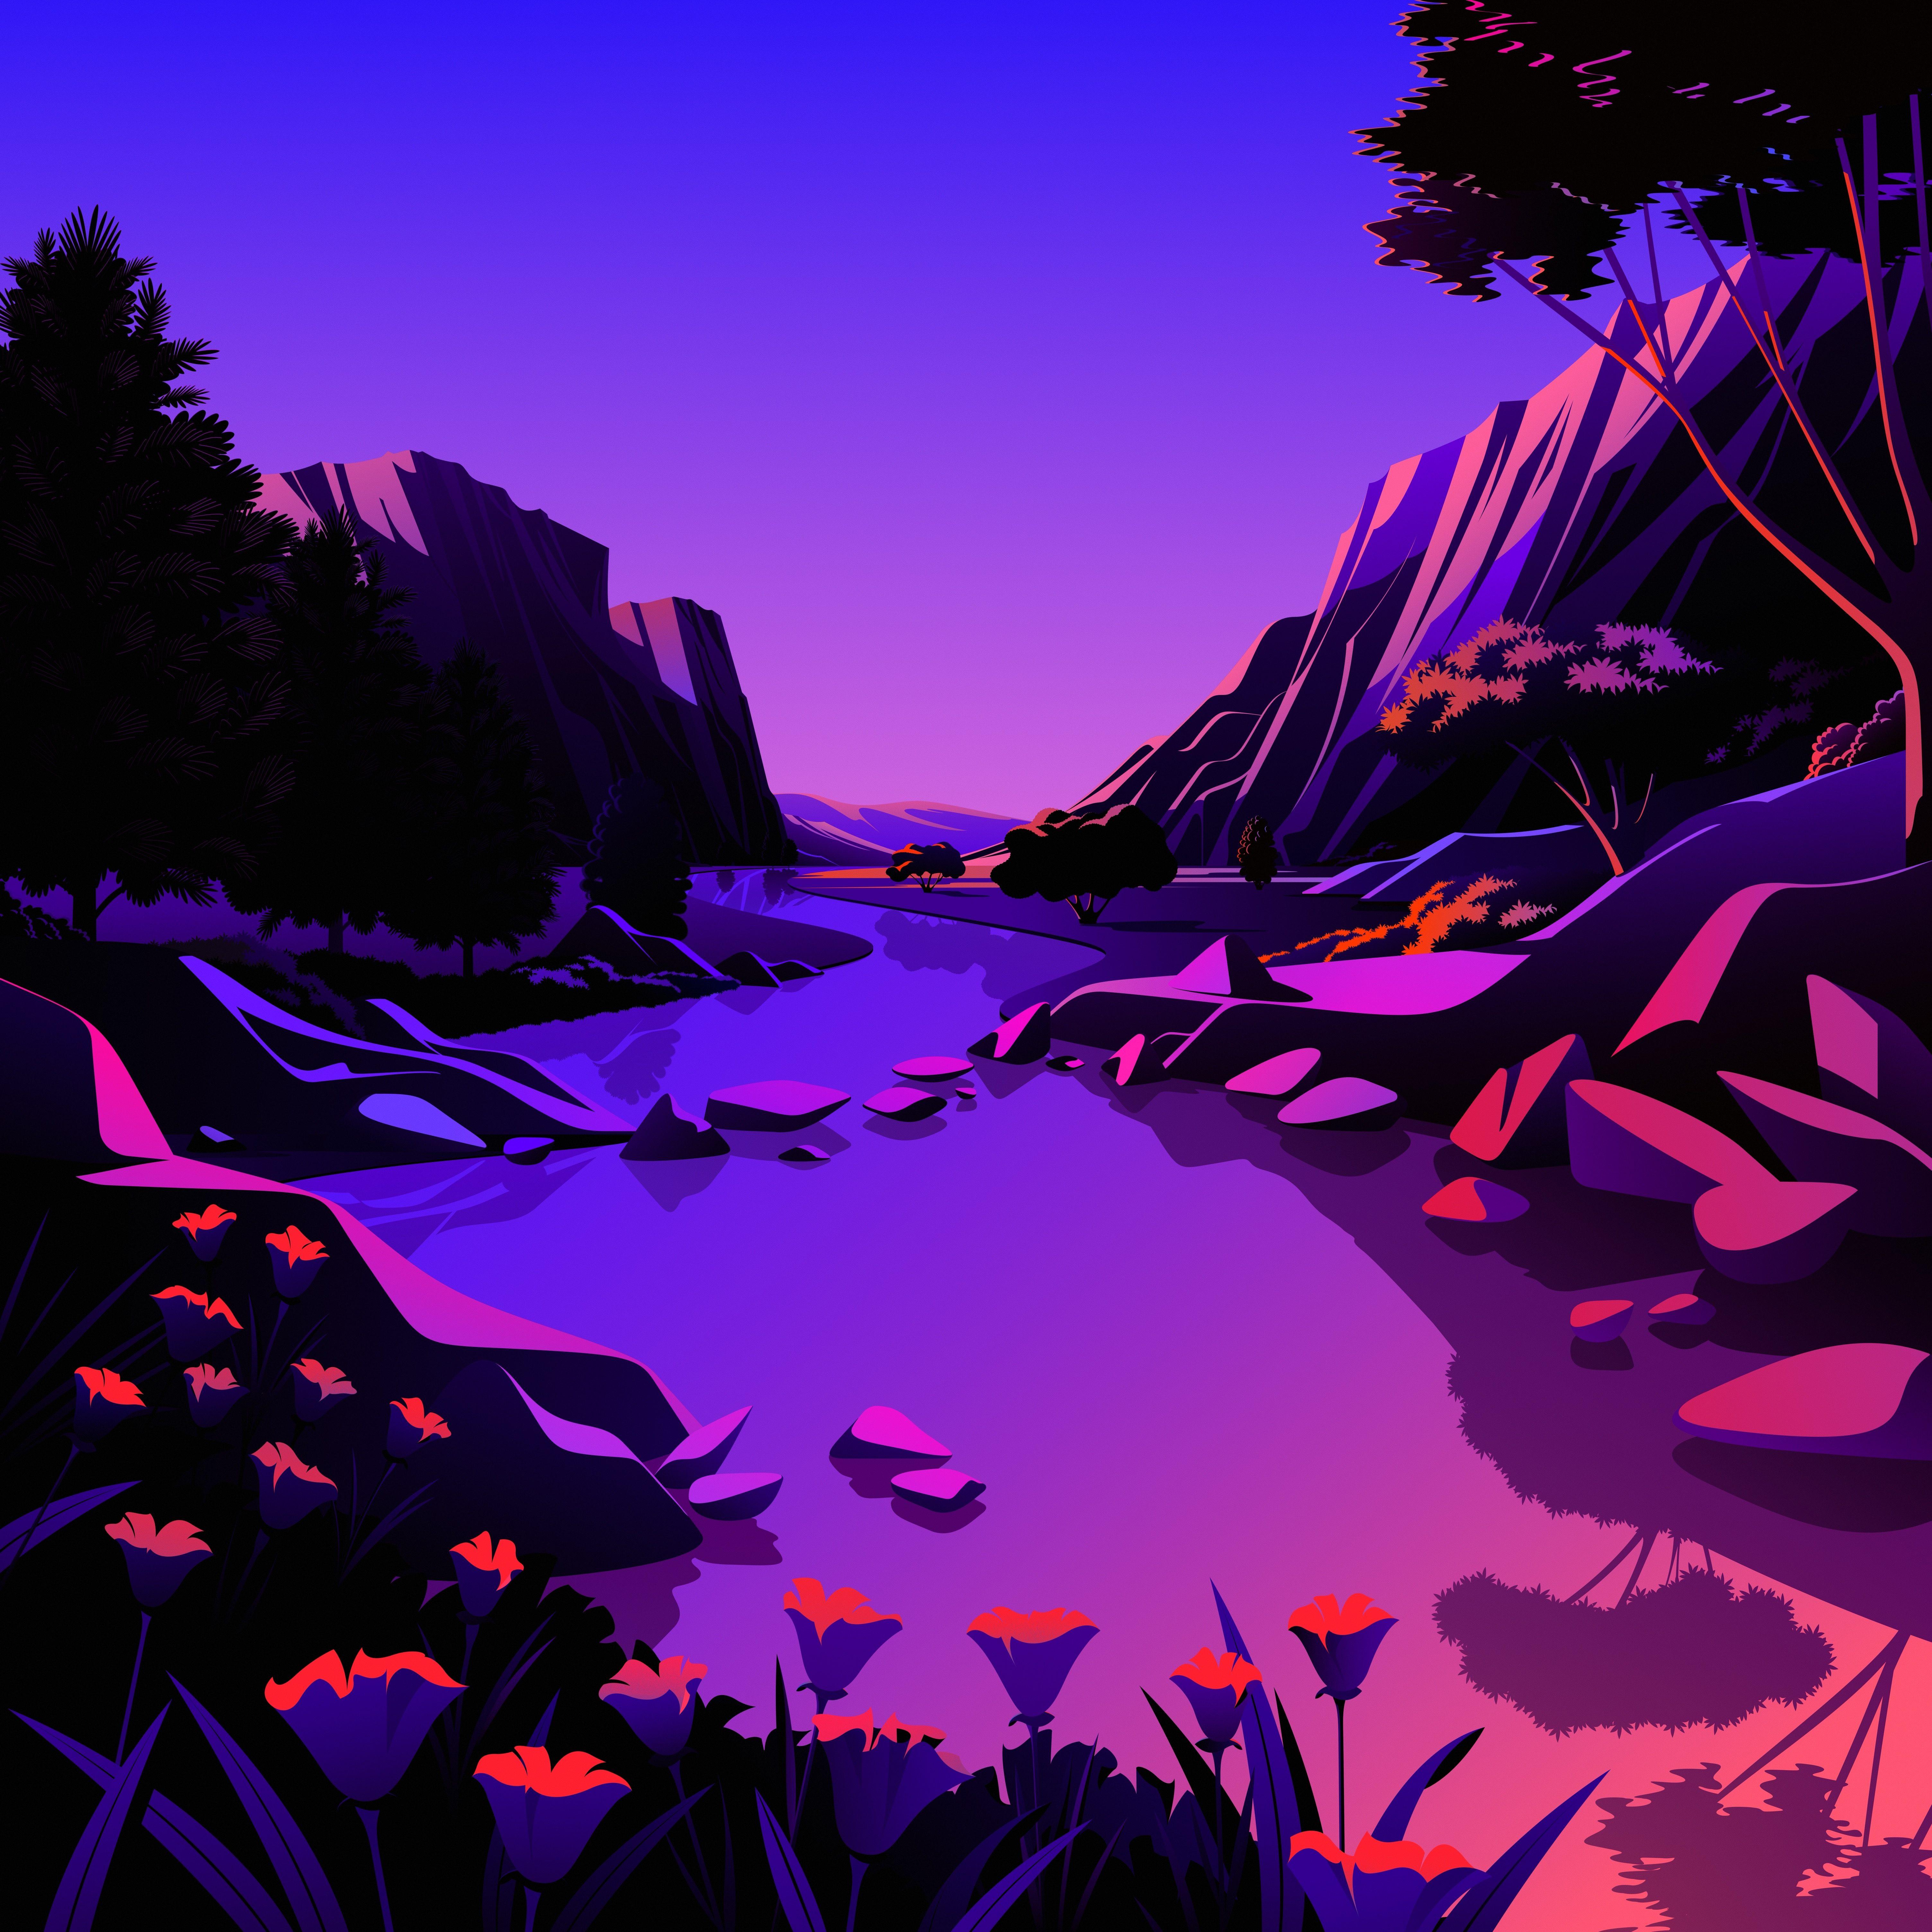 macOS Big Sur The Lake 7 dragged